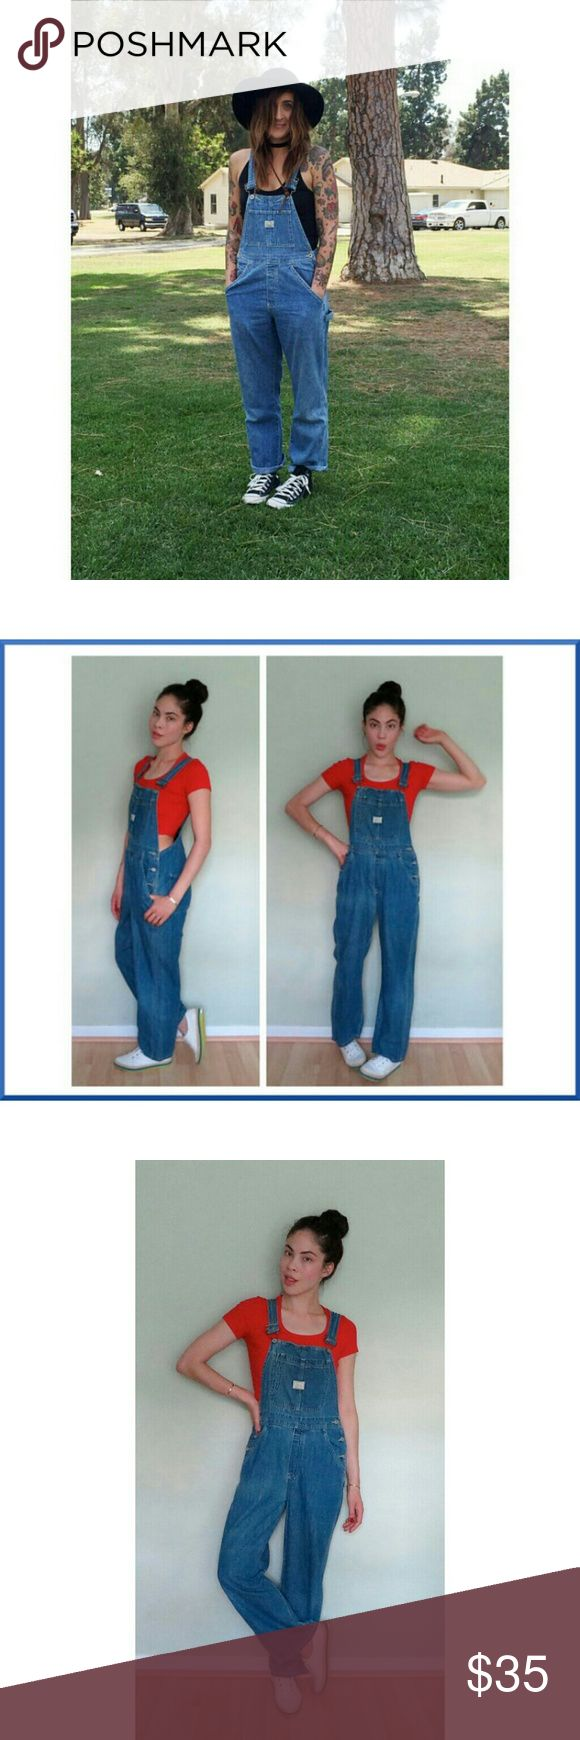 Vintage Old Navy Denim Blue Jean Overalls? Vintage Old Navy Denim Blue Jean Overalls?  Size Medium EUC! Old Navy Pants Jumpsuits & Rompers